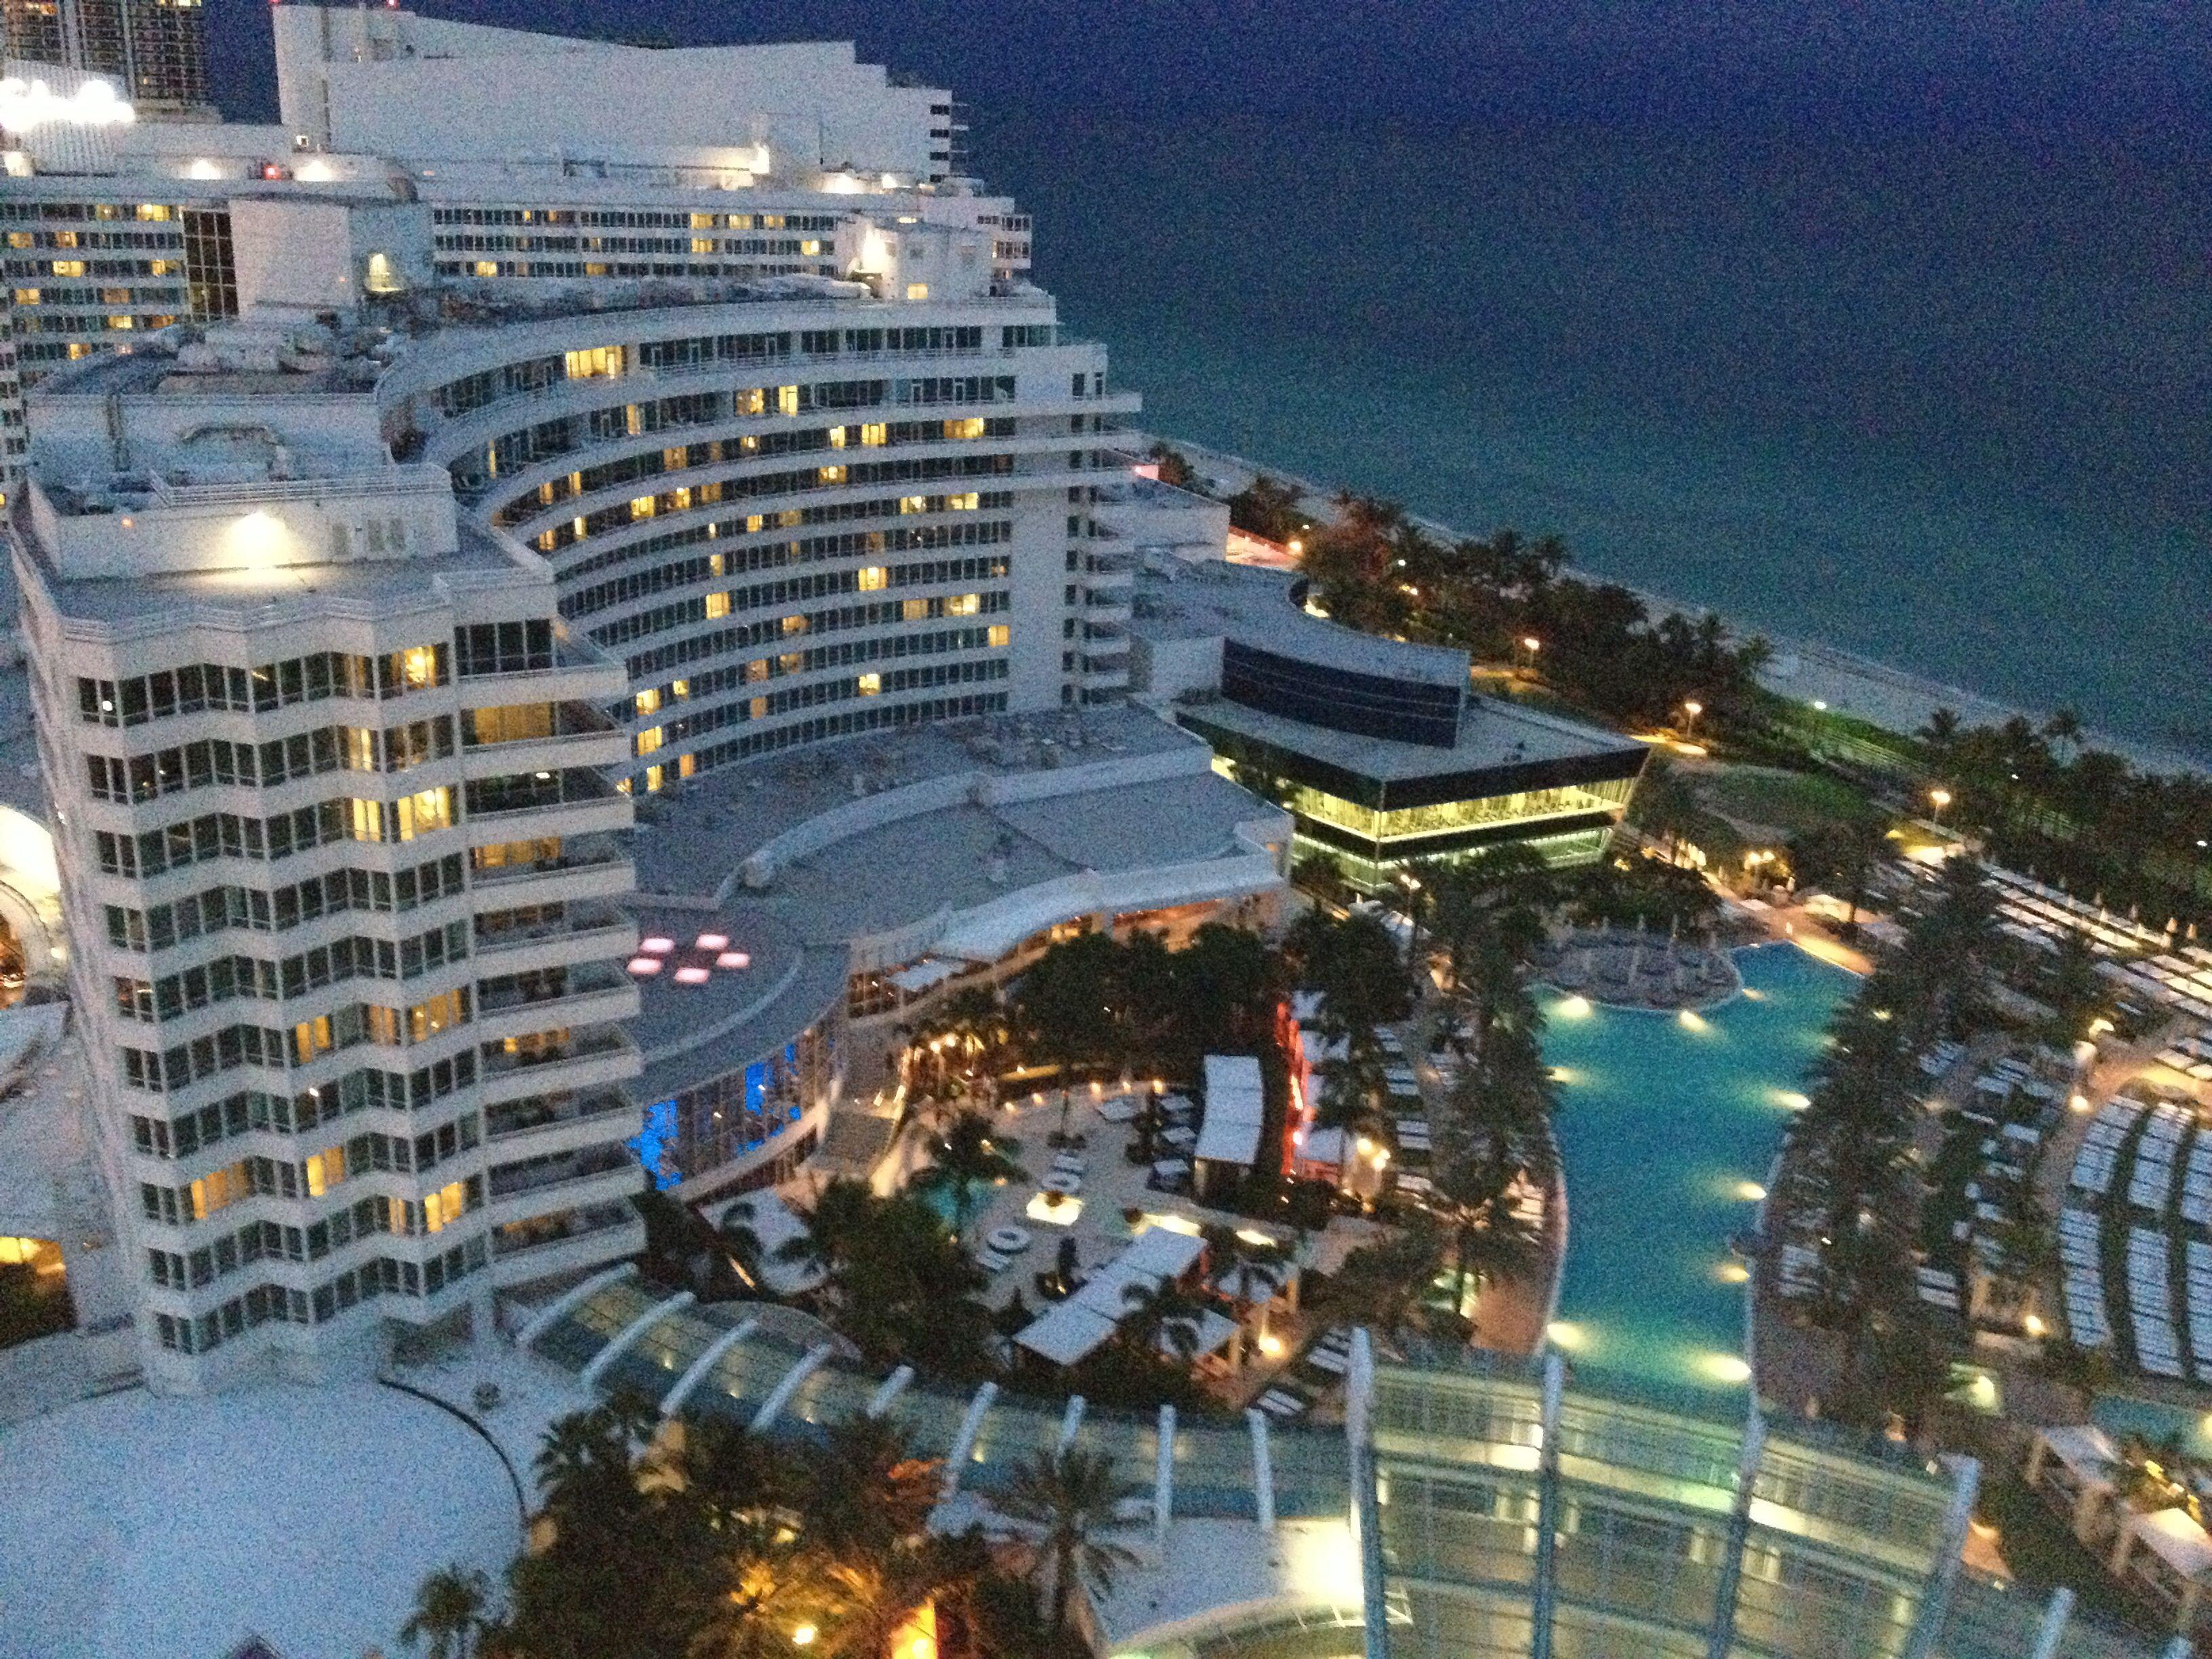 A Party Hotel Gr8 Pools Beach Restaurants Night Club Fountain